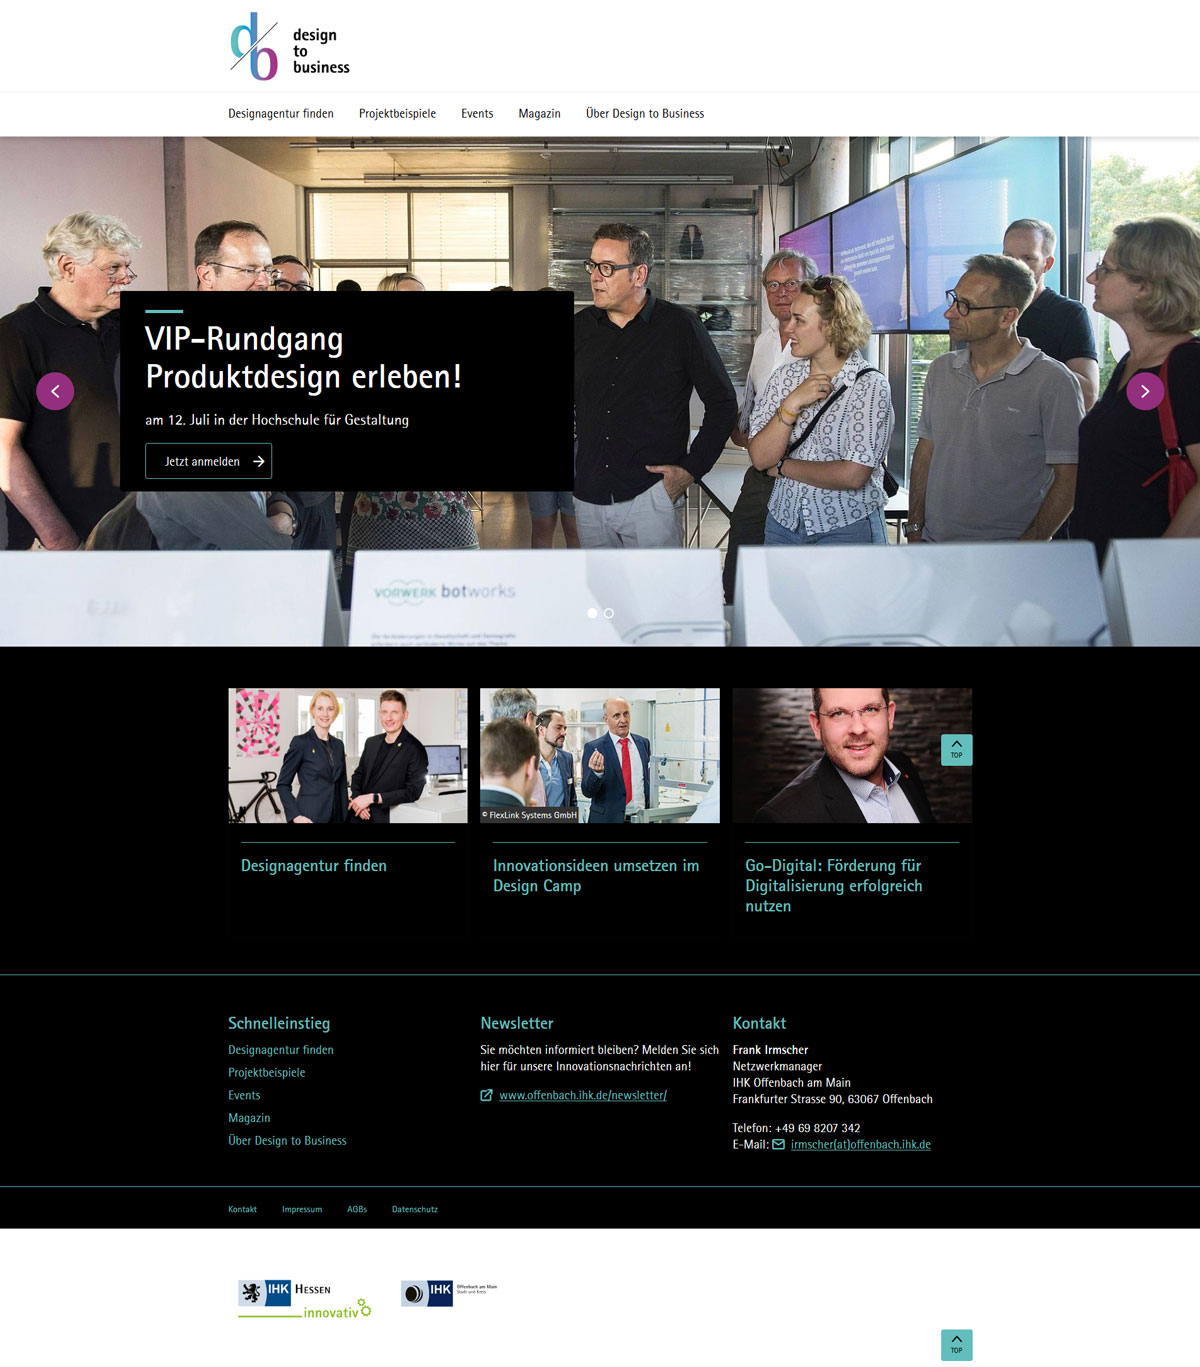 Design to Business webFLEX media Beitrag